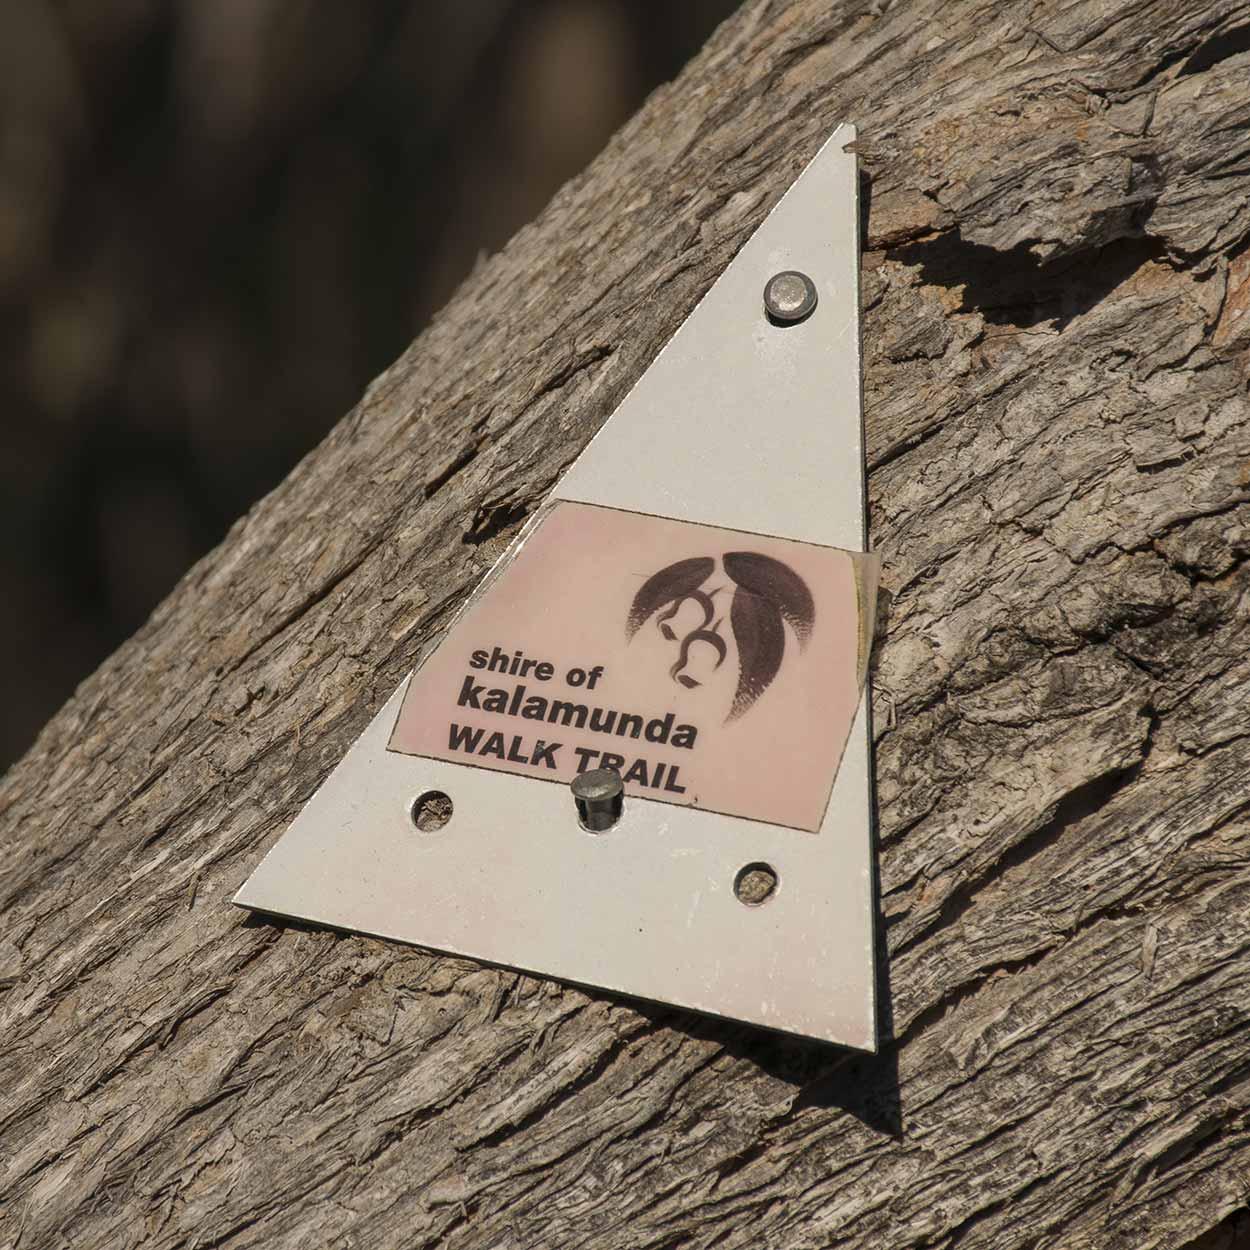 Whistlepipe Gully Walk trail marker, Mundy Regional Park, Perth, Western Australia